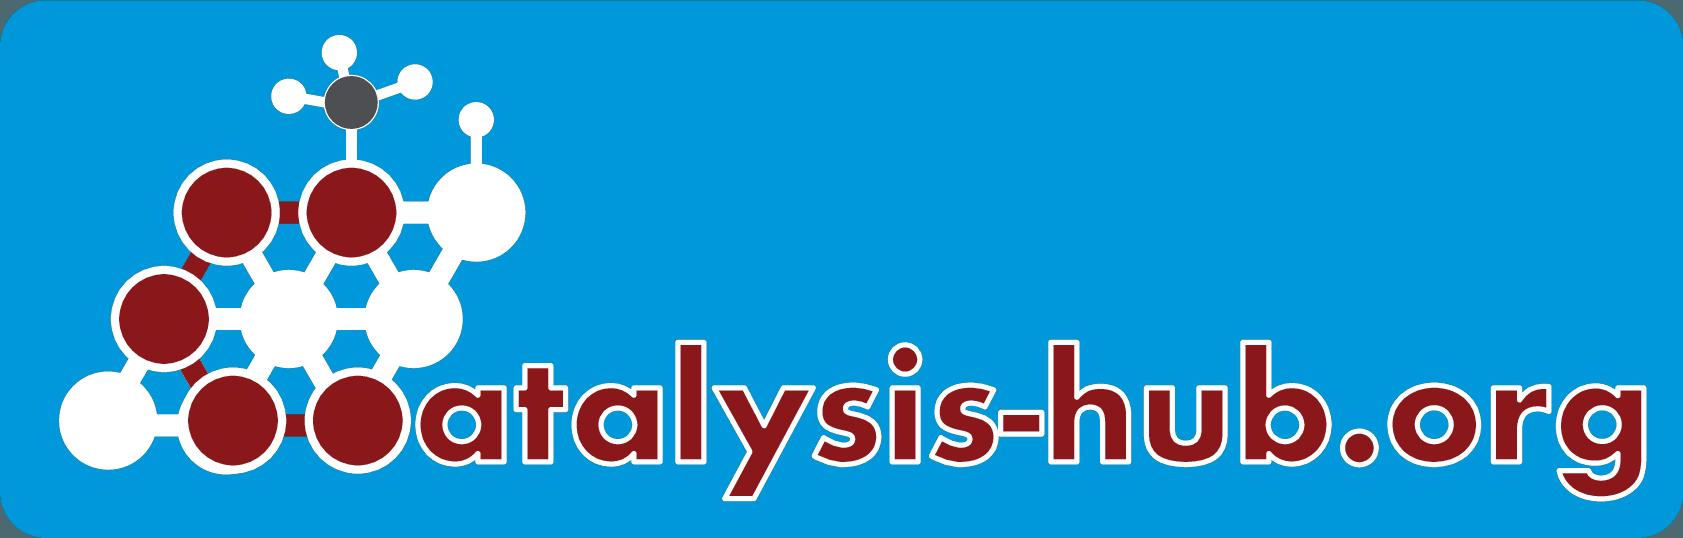 Catalysis_hub.png